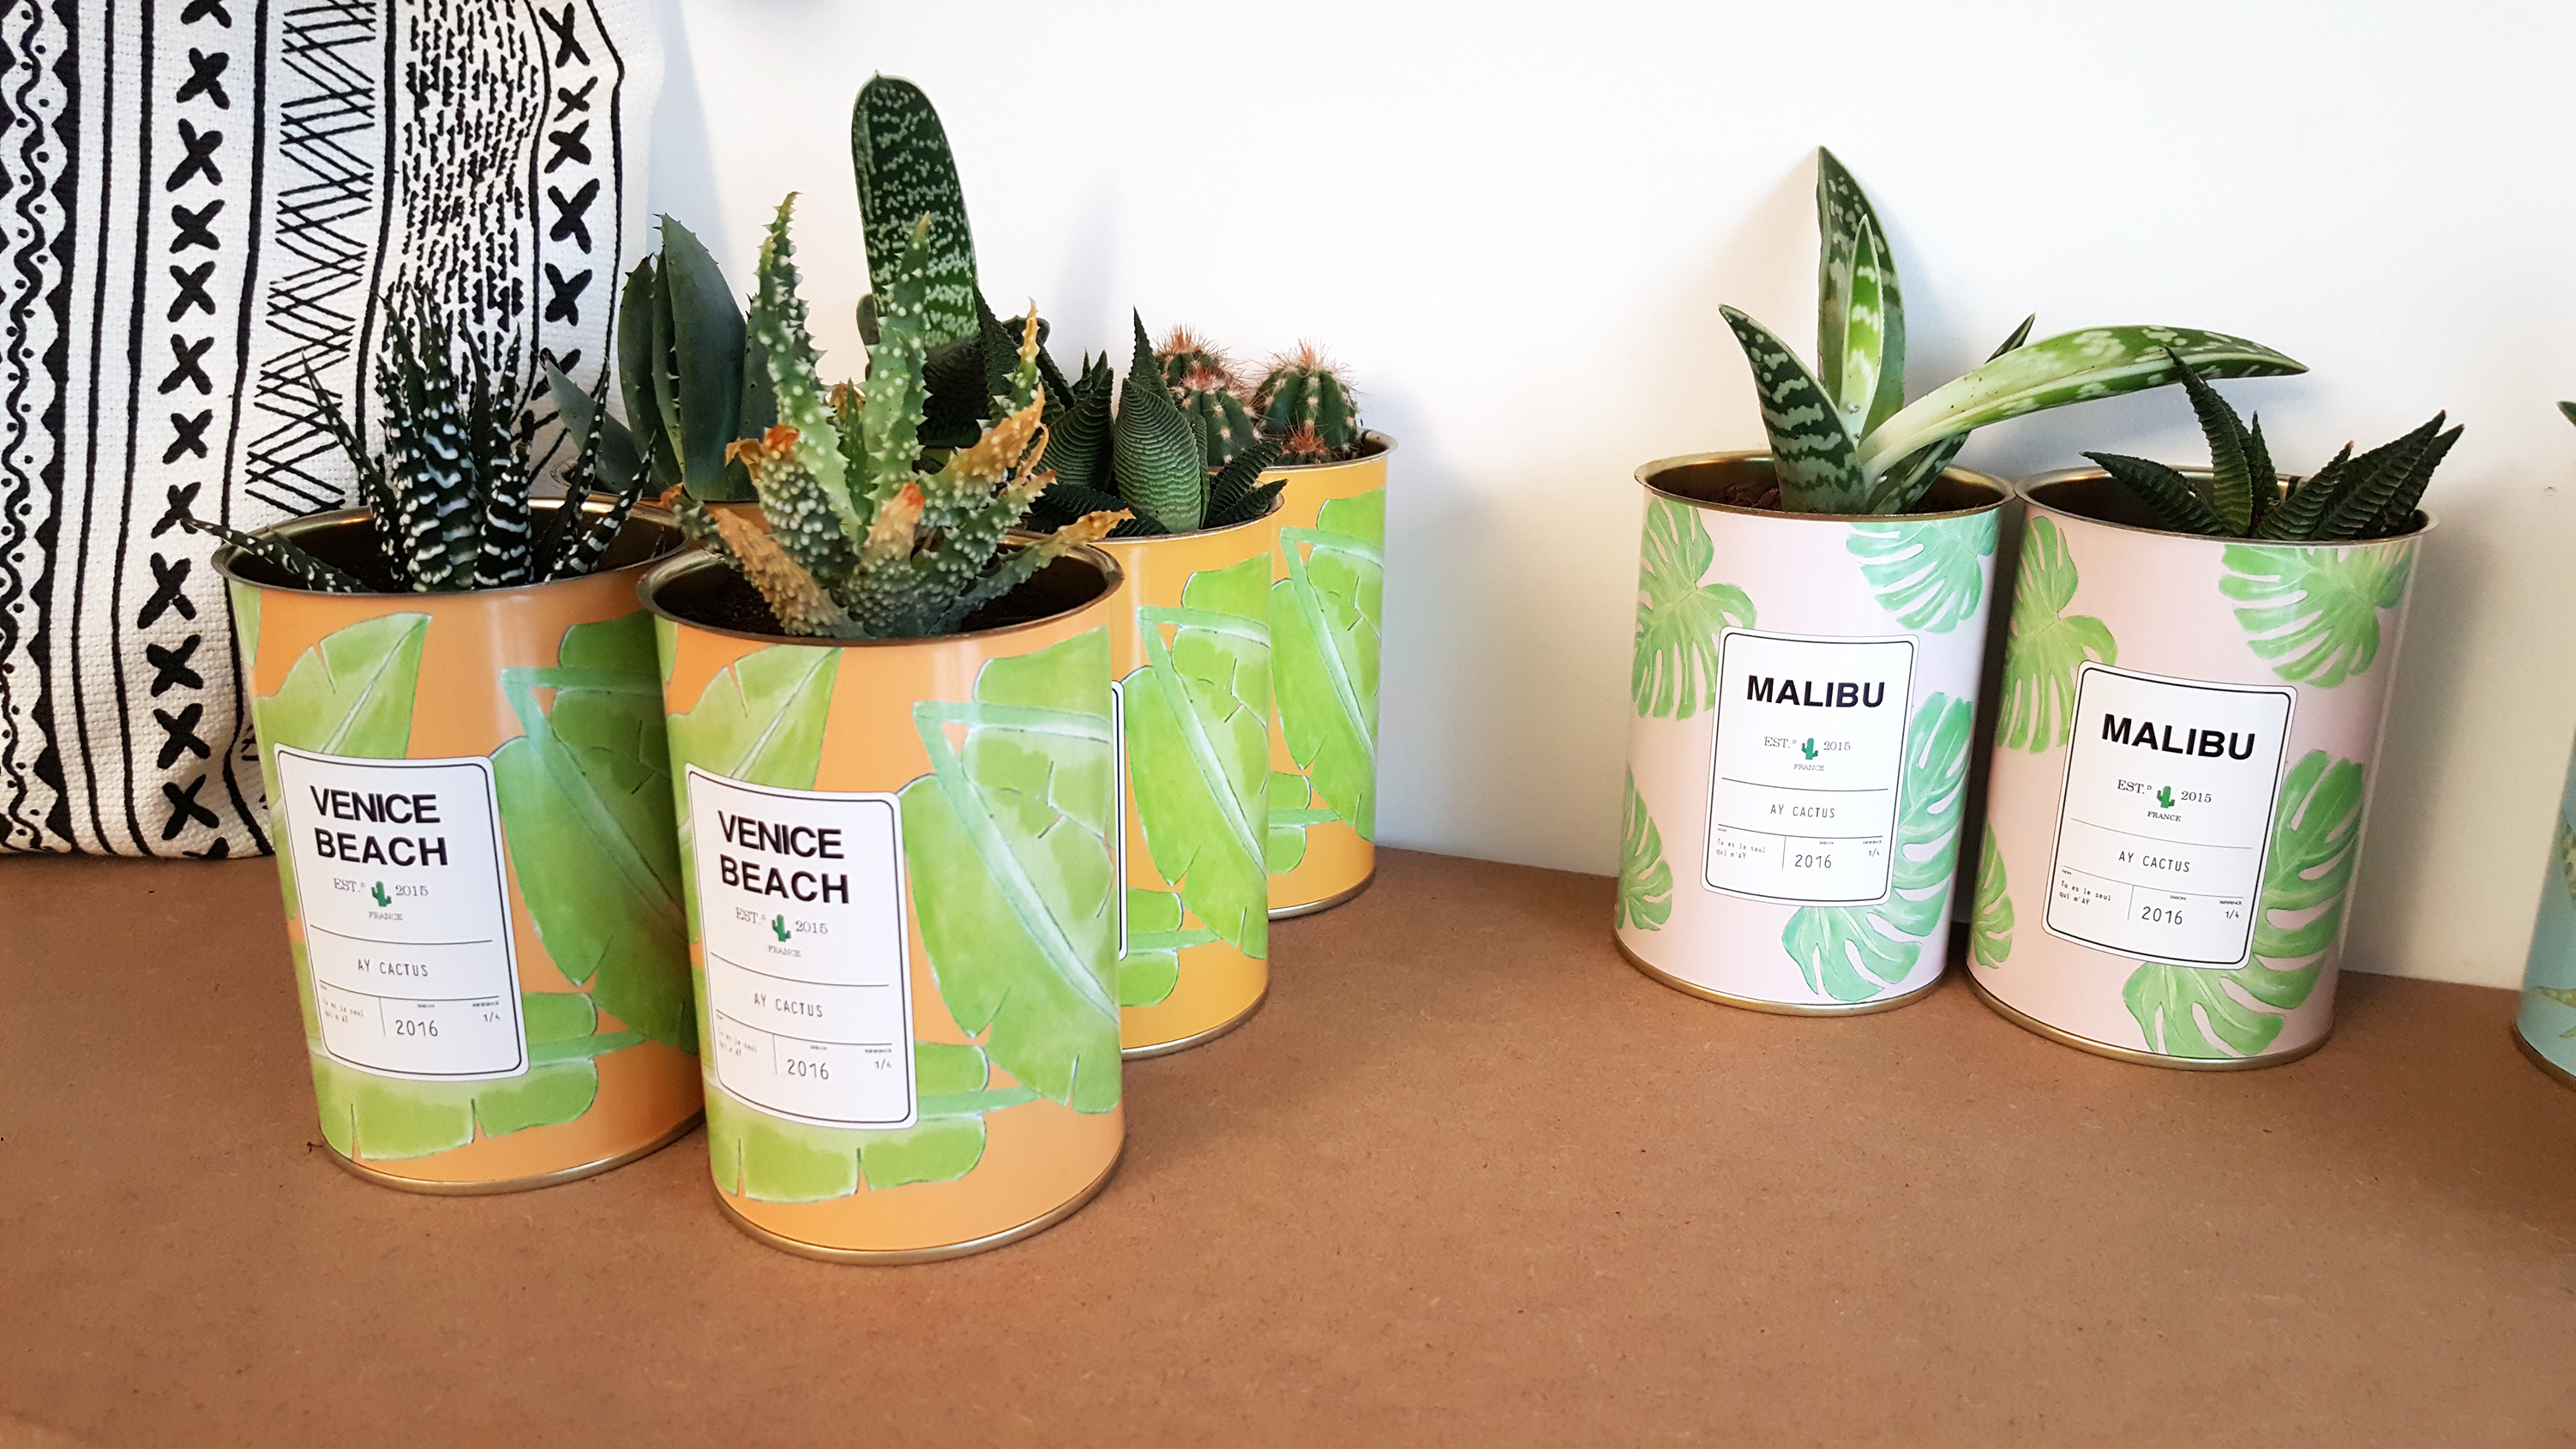 acheter cactus. Black Bedroom Furniture Sets. Home Design Ideas